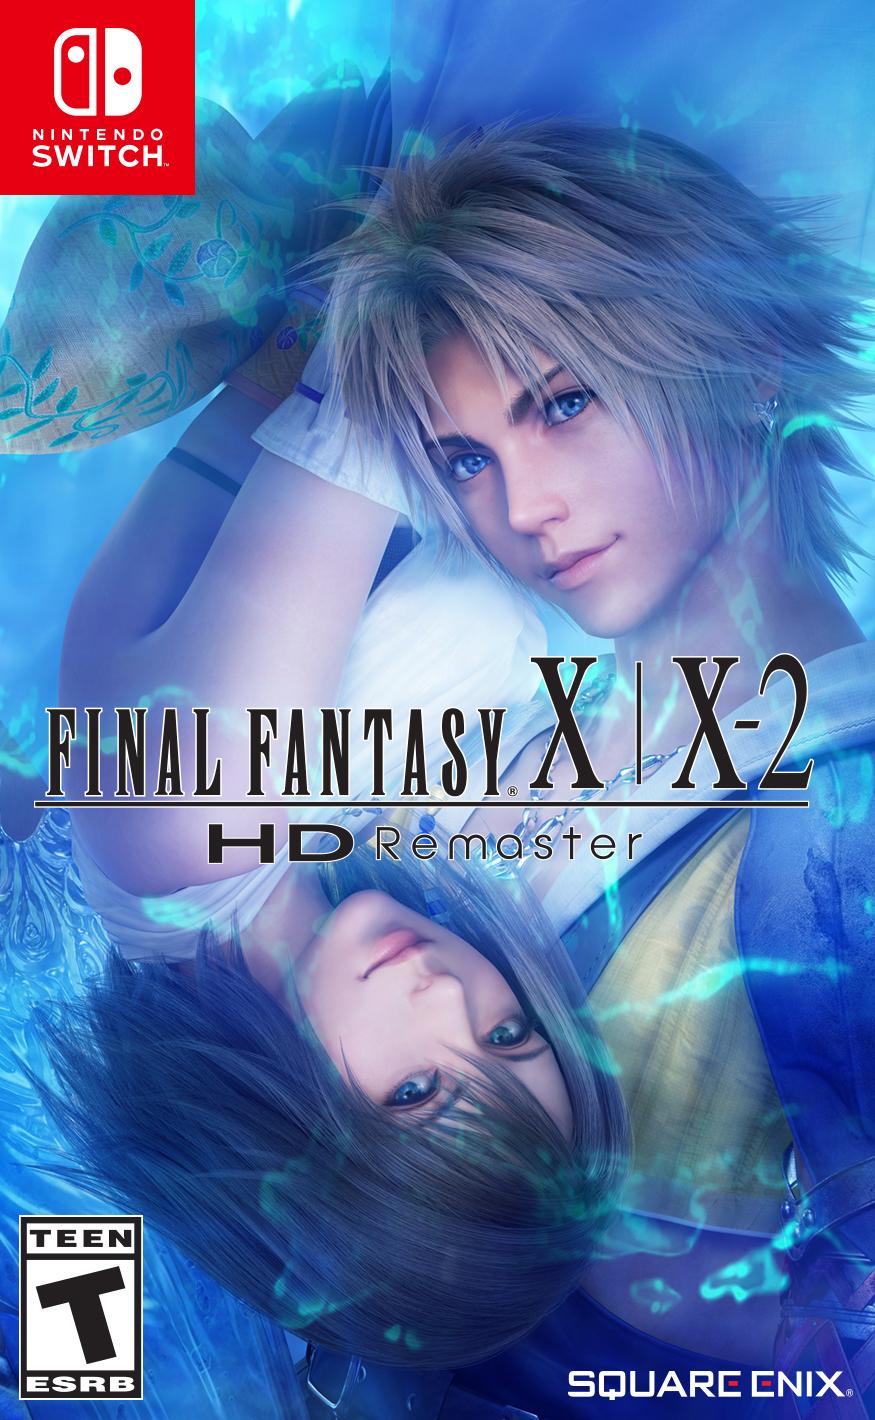 FINAL FANTASY X/X-2 HD Remaster (Nintendo Switch) / FF XII Zodiac Age @ Game